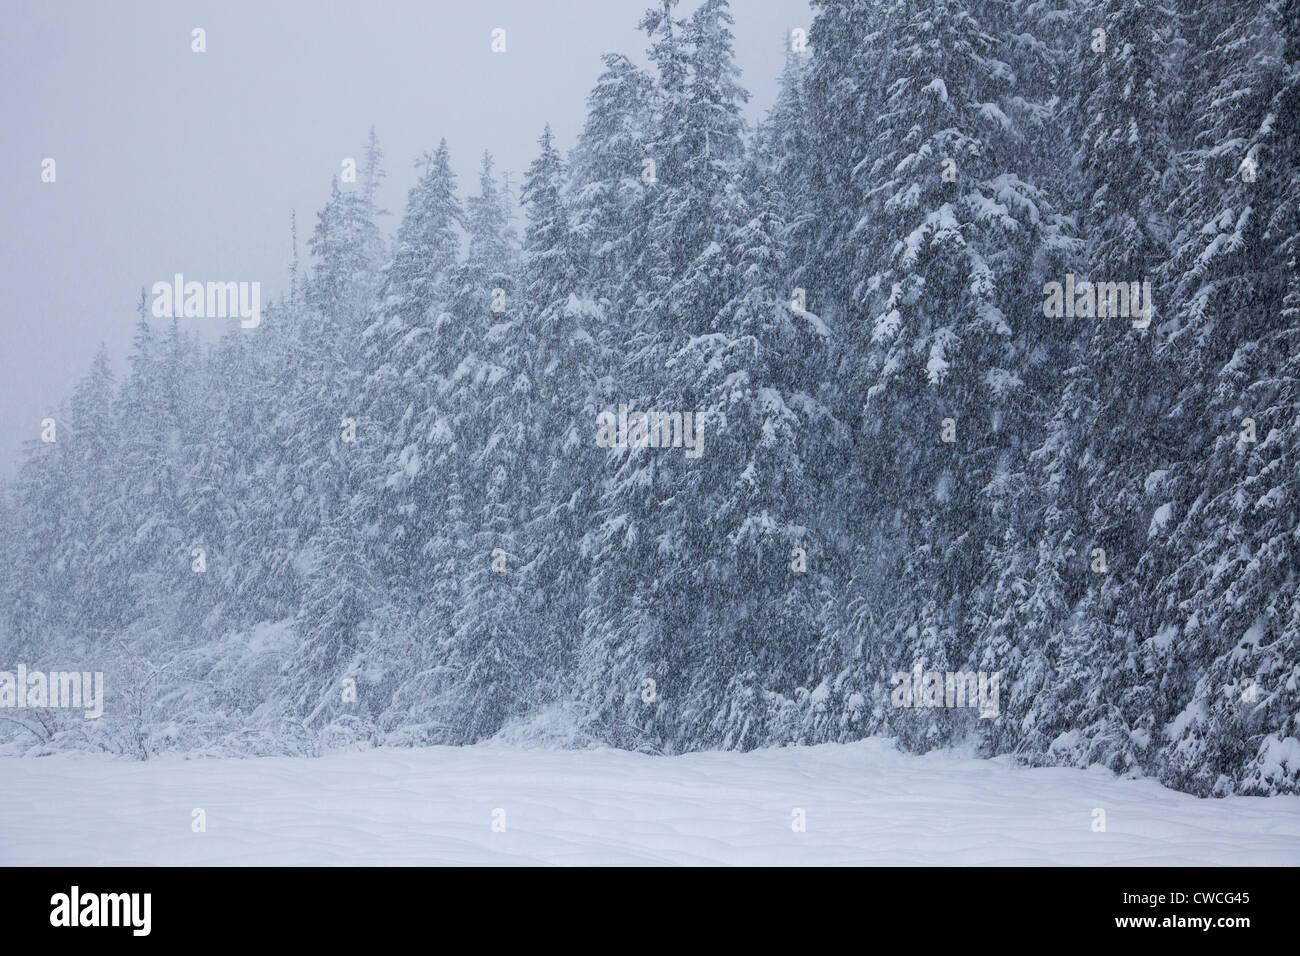 Snowy winter trees, Chugach National Forest, Alaska. - Stock Image